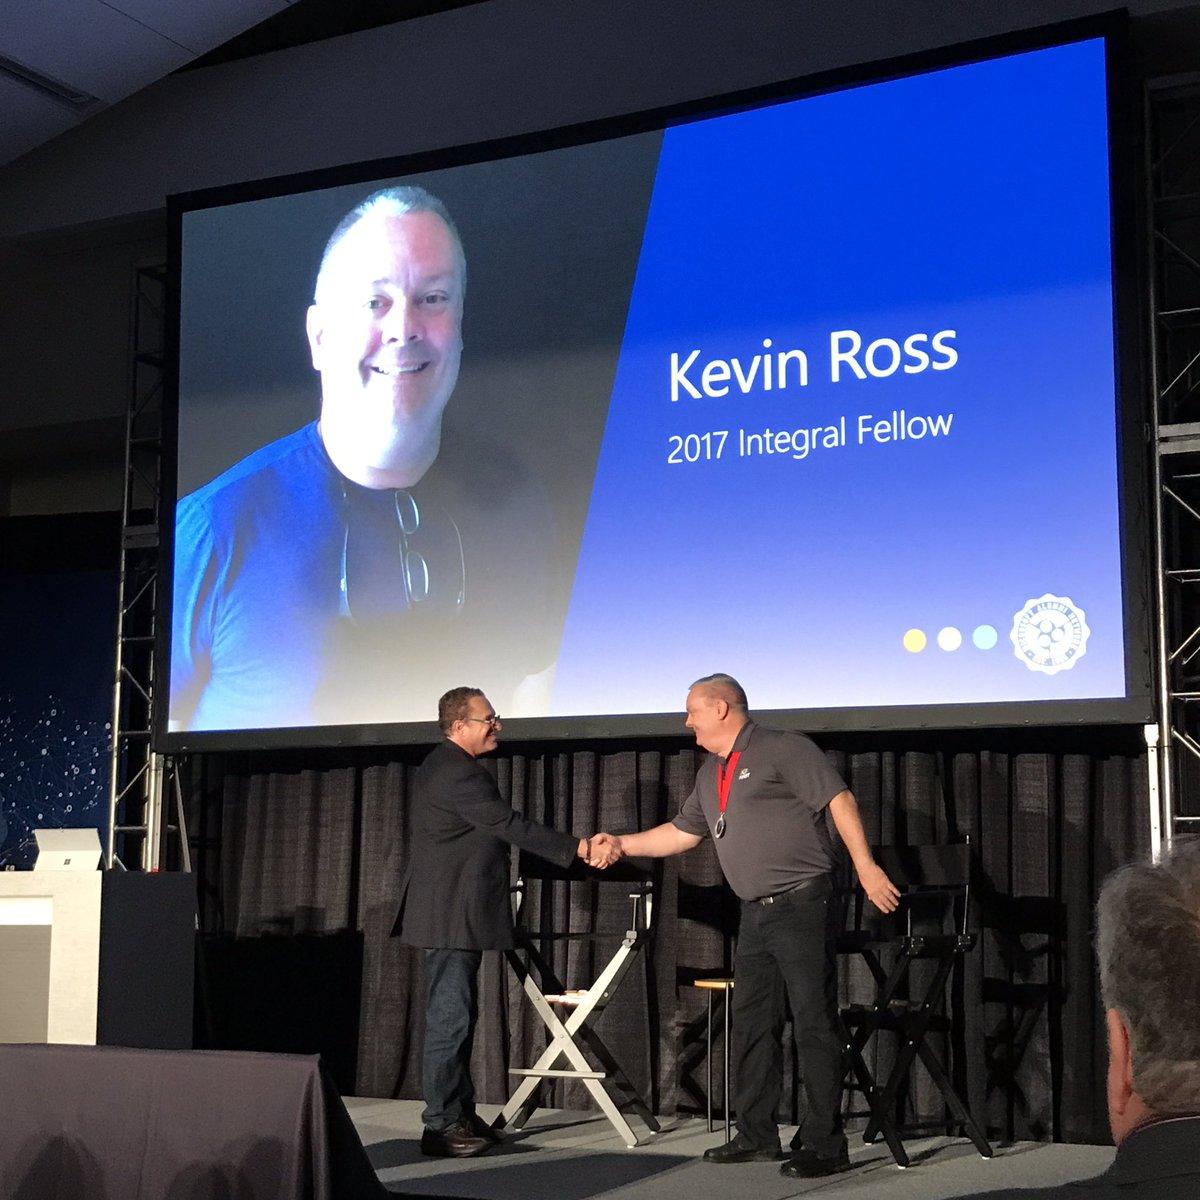 Congratulations to Kevin Ross ... The Microsoft Alumni Network 2017 Integral Fellow   #MSFTalum with @RichardJKaplan<br>http://pic.twitter.com/lVpo1RVjNt